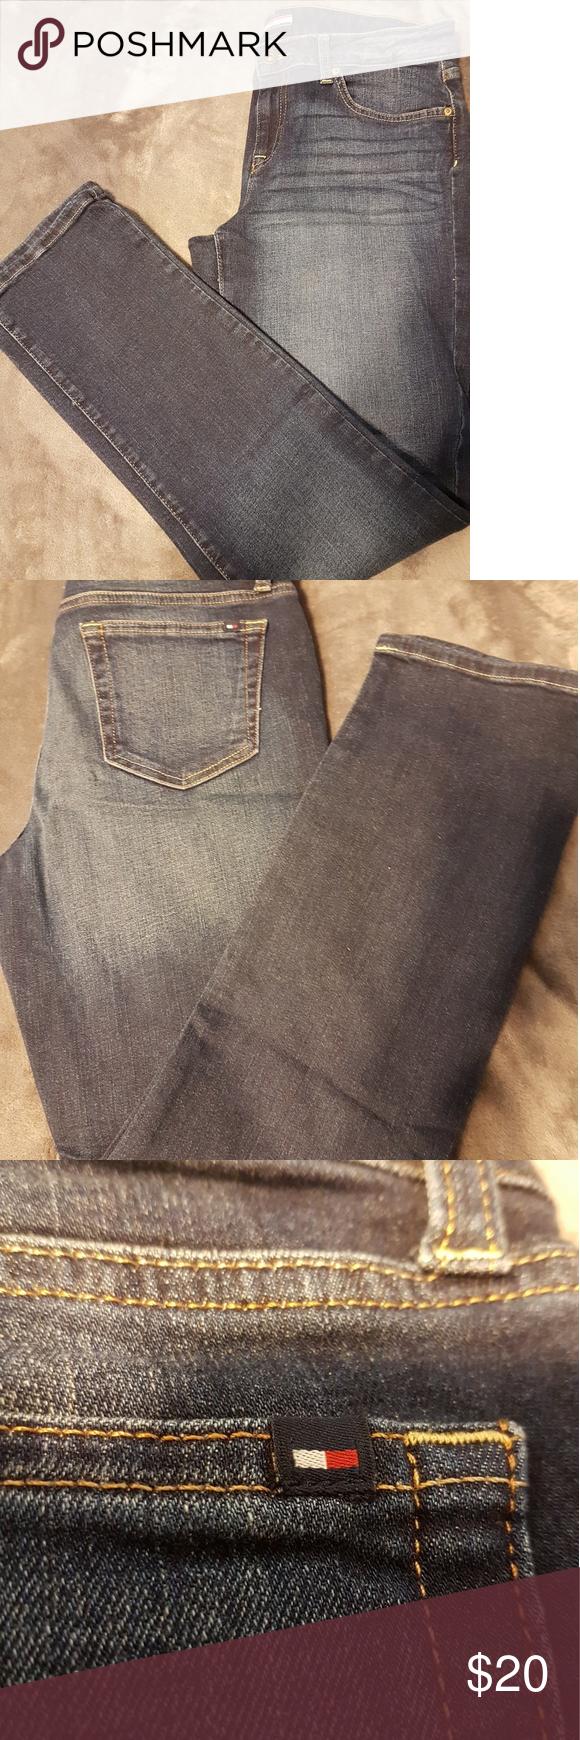 NWOT TOMMY Hilfiger jeans Tommy jeans size 10 Tommy Hilfiger Jeans Straight Leg